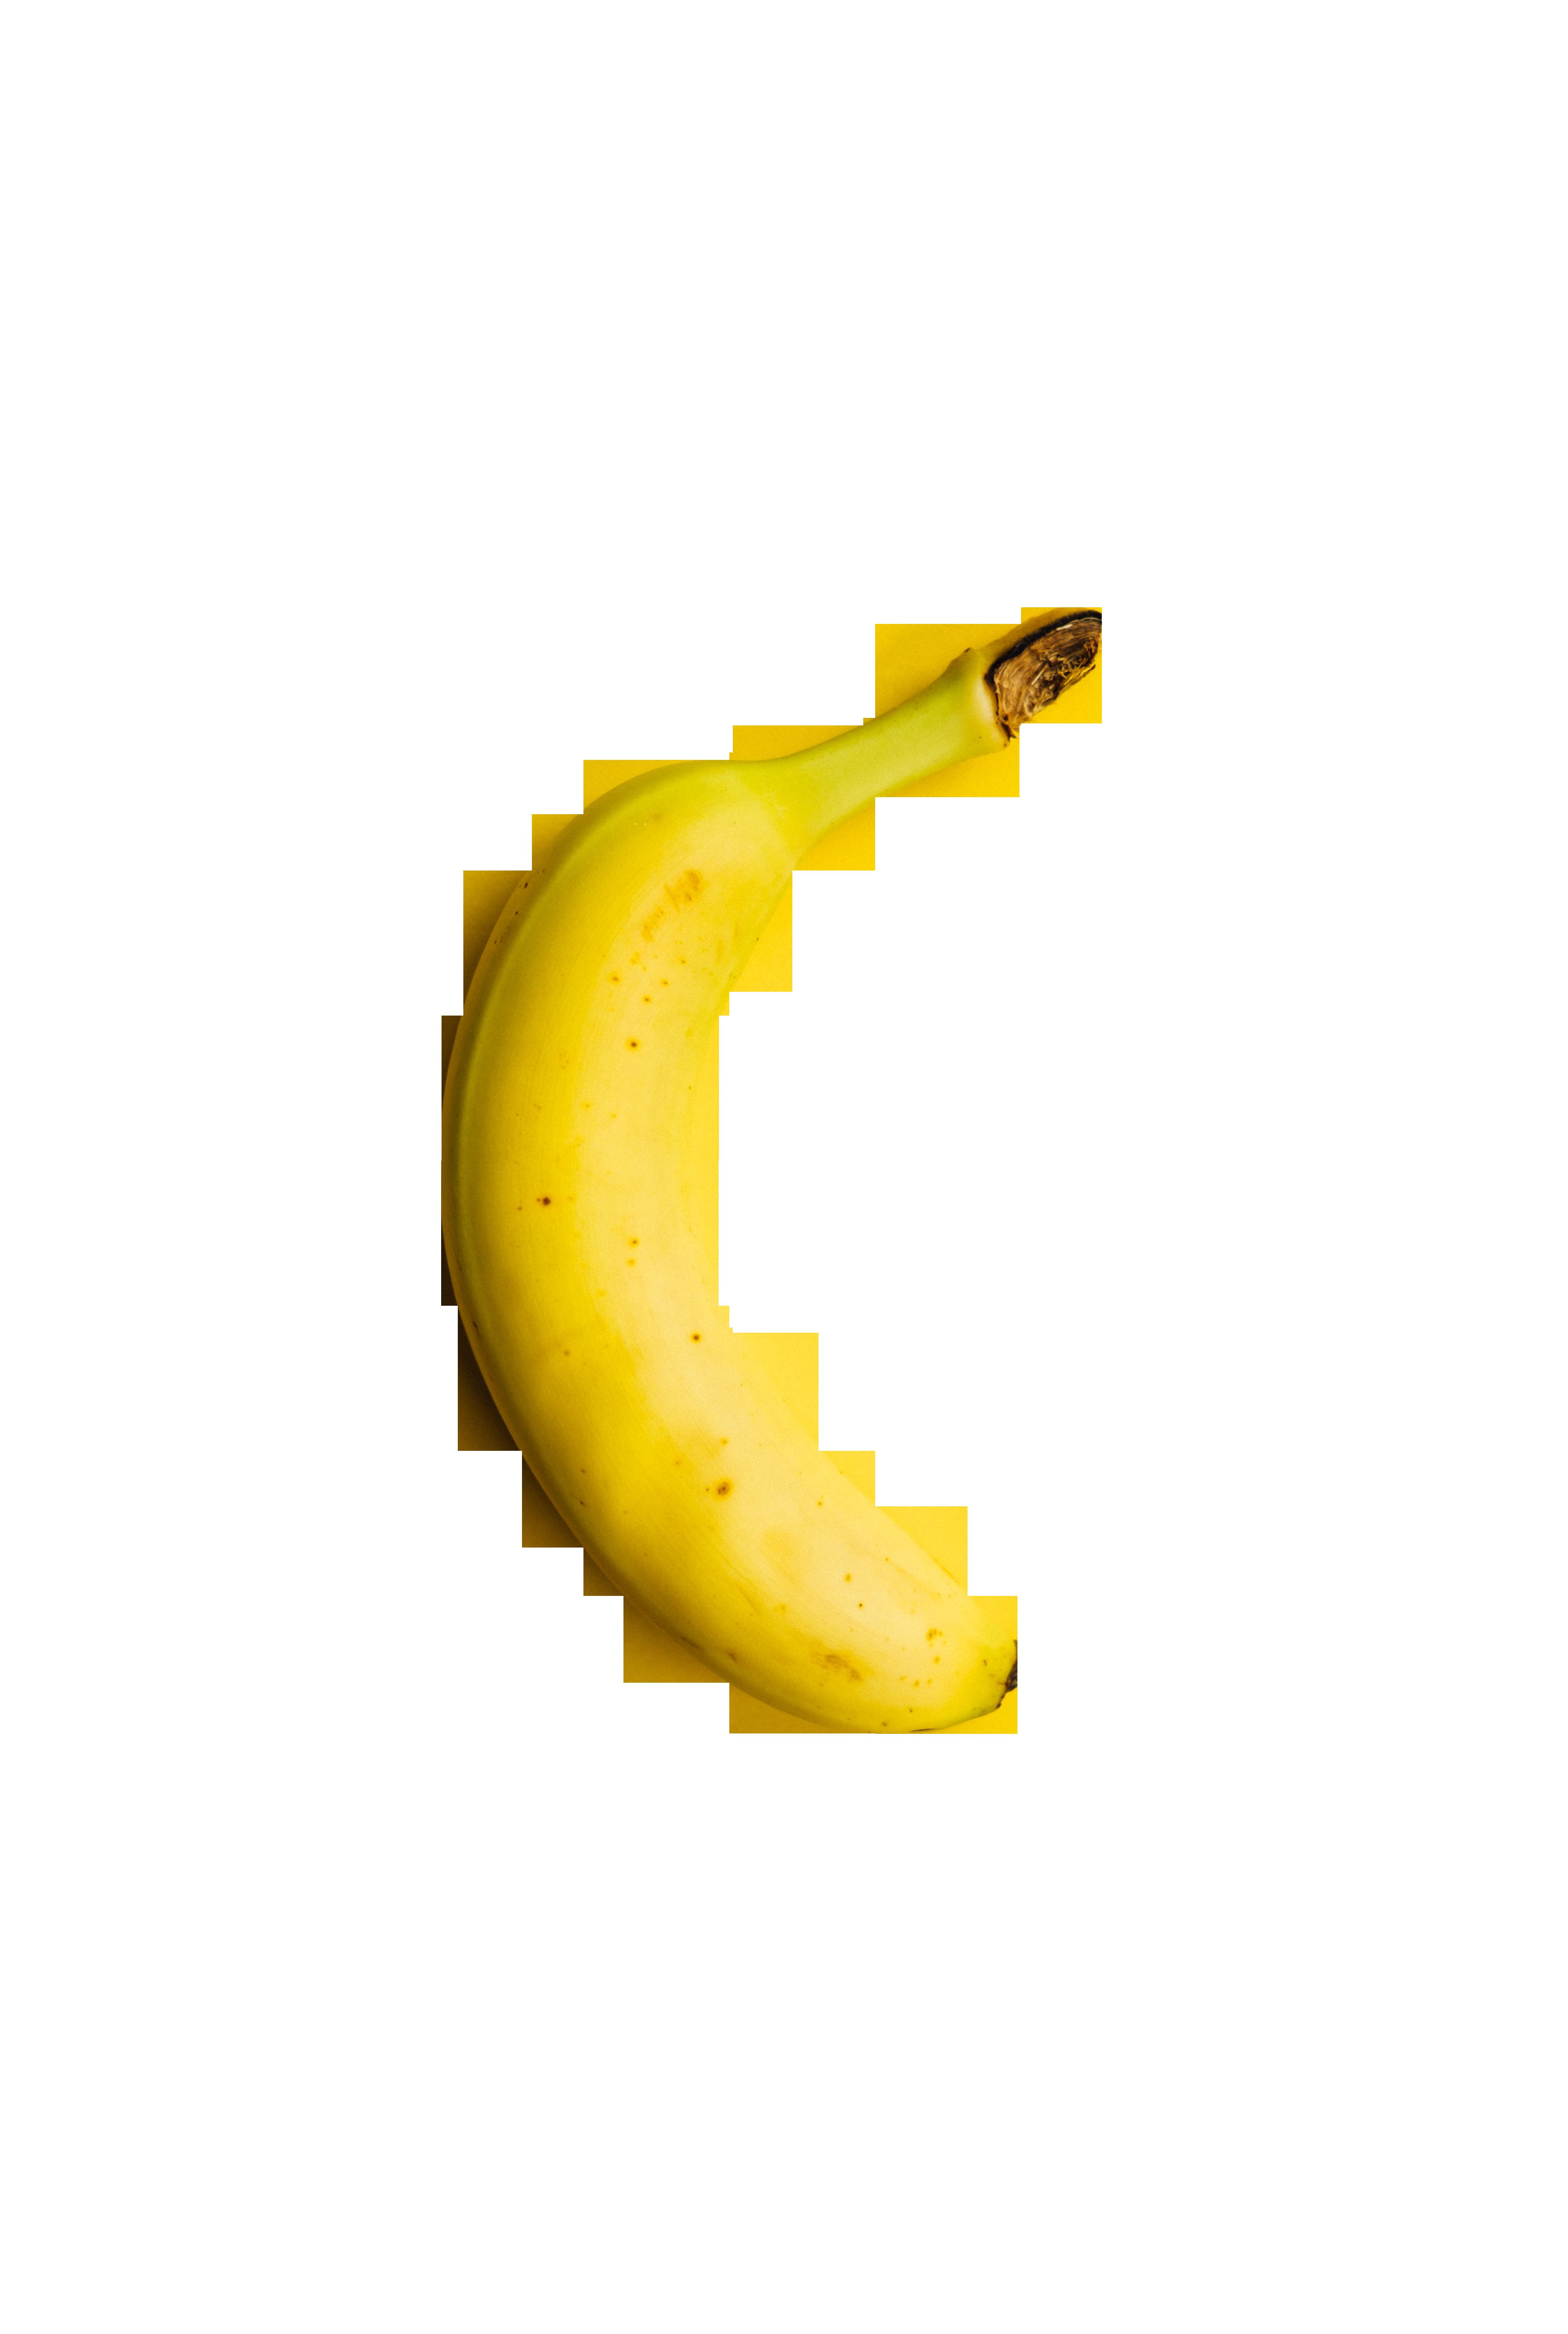 Single banana Transparent Background PNG